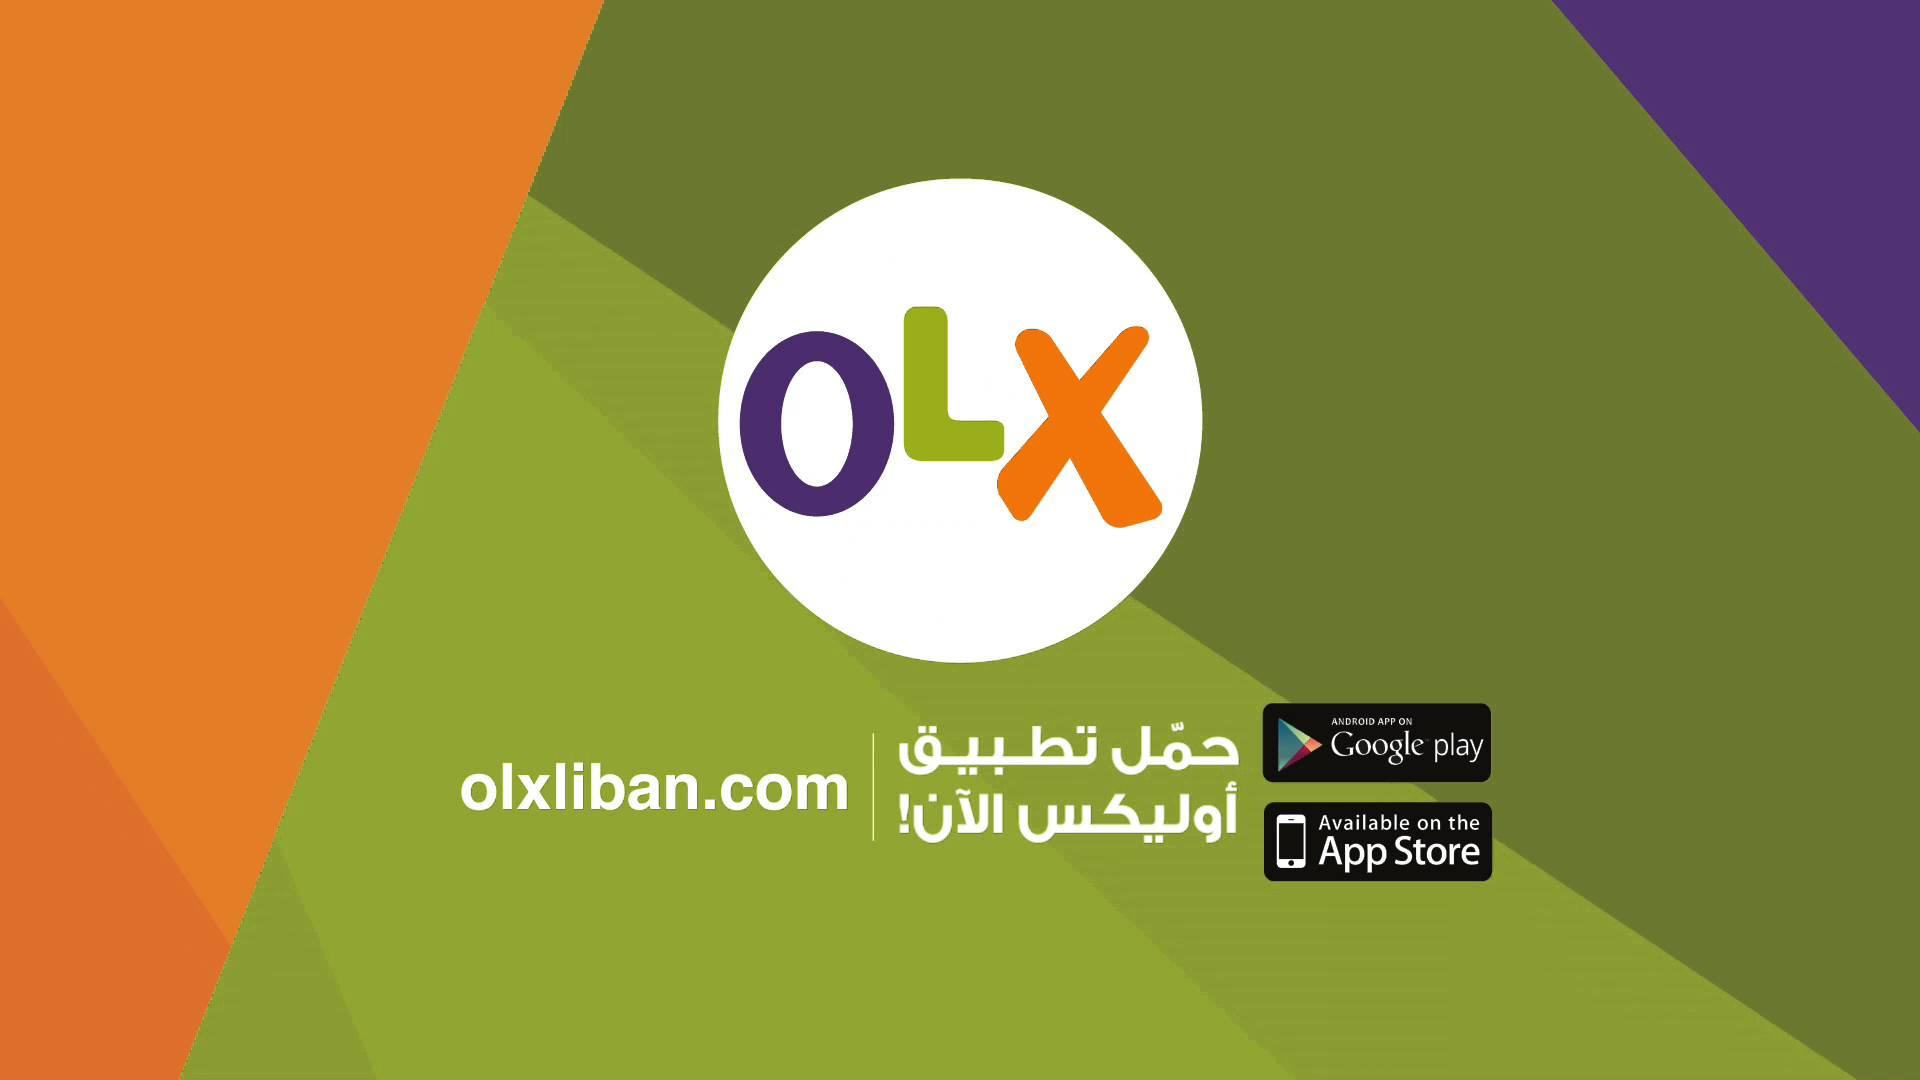 Photo of تحميل تطبيق أوليكس OLX لهواتف اندرويد للبيع والشراء